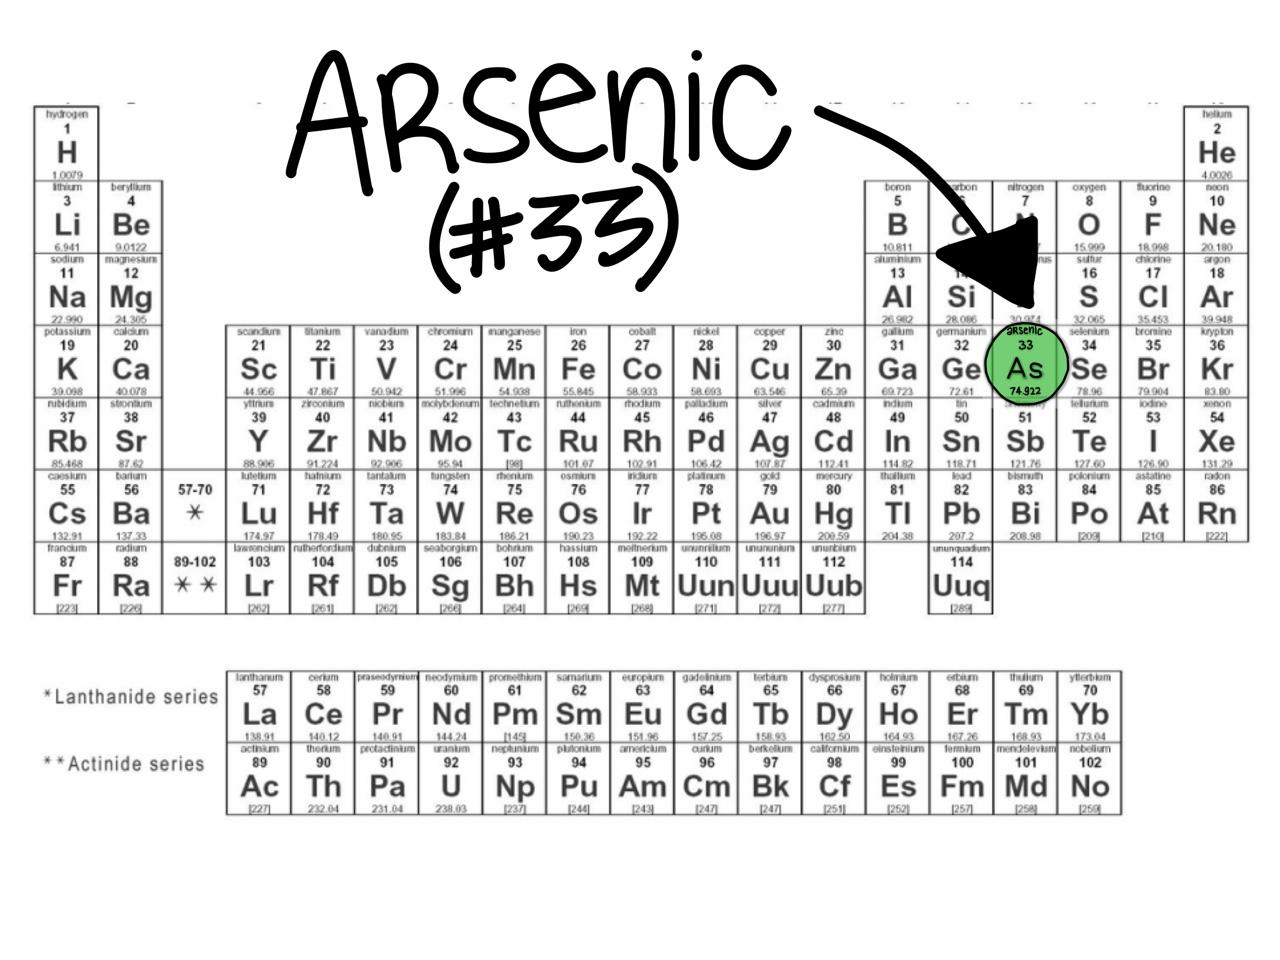 Arsenic The Element By Bena Patel